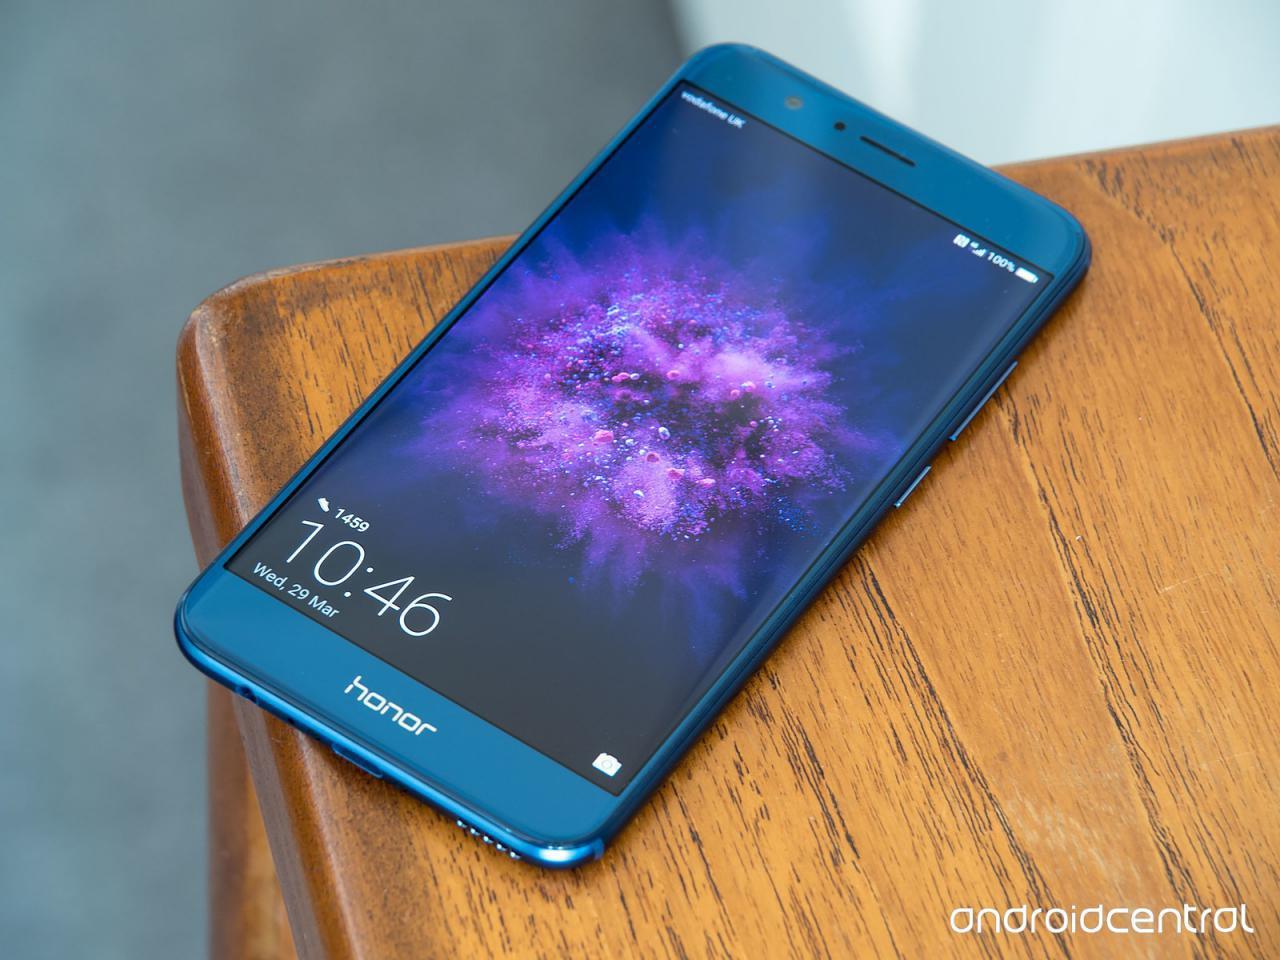 دامپ هارد هواوی هانر8 Huawei honor 8 FRD-L09 emmc dump تست شده